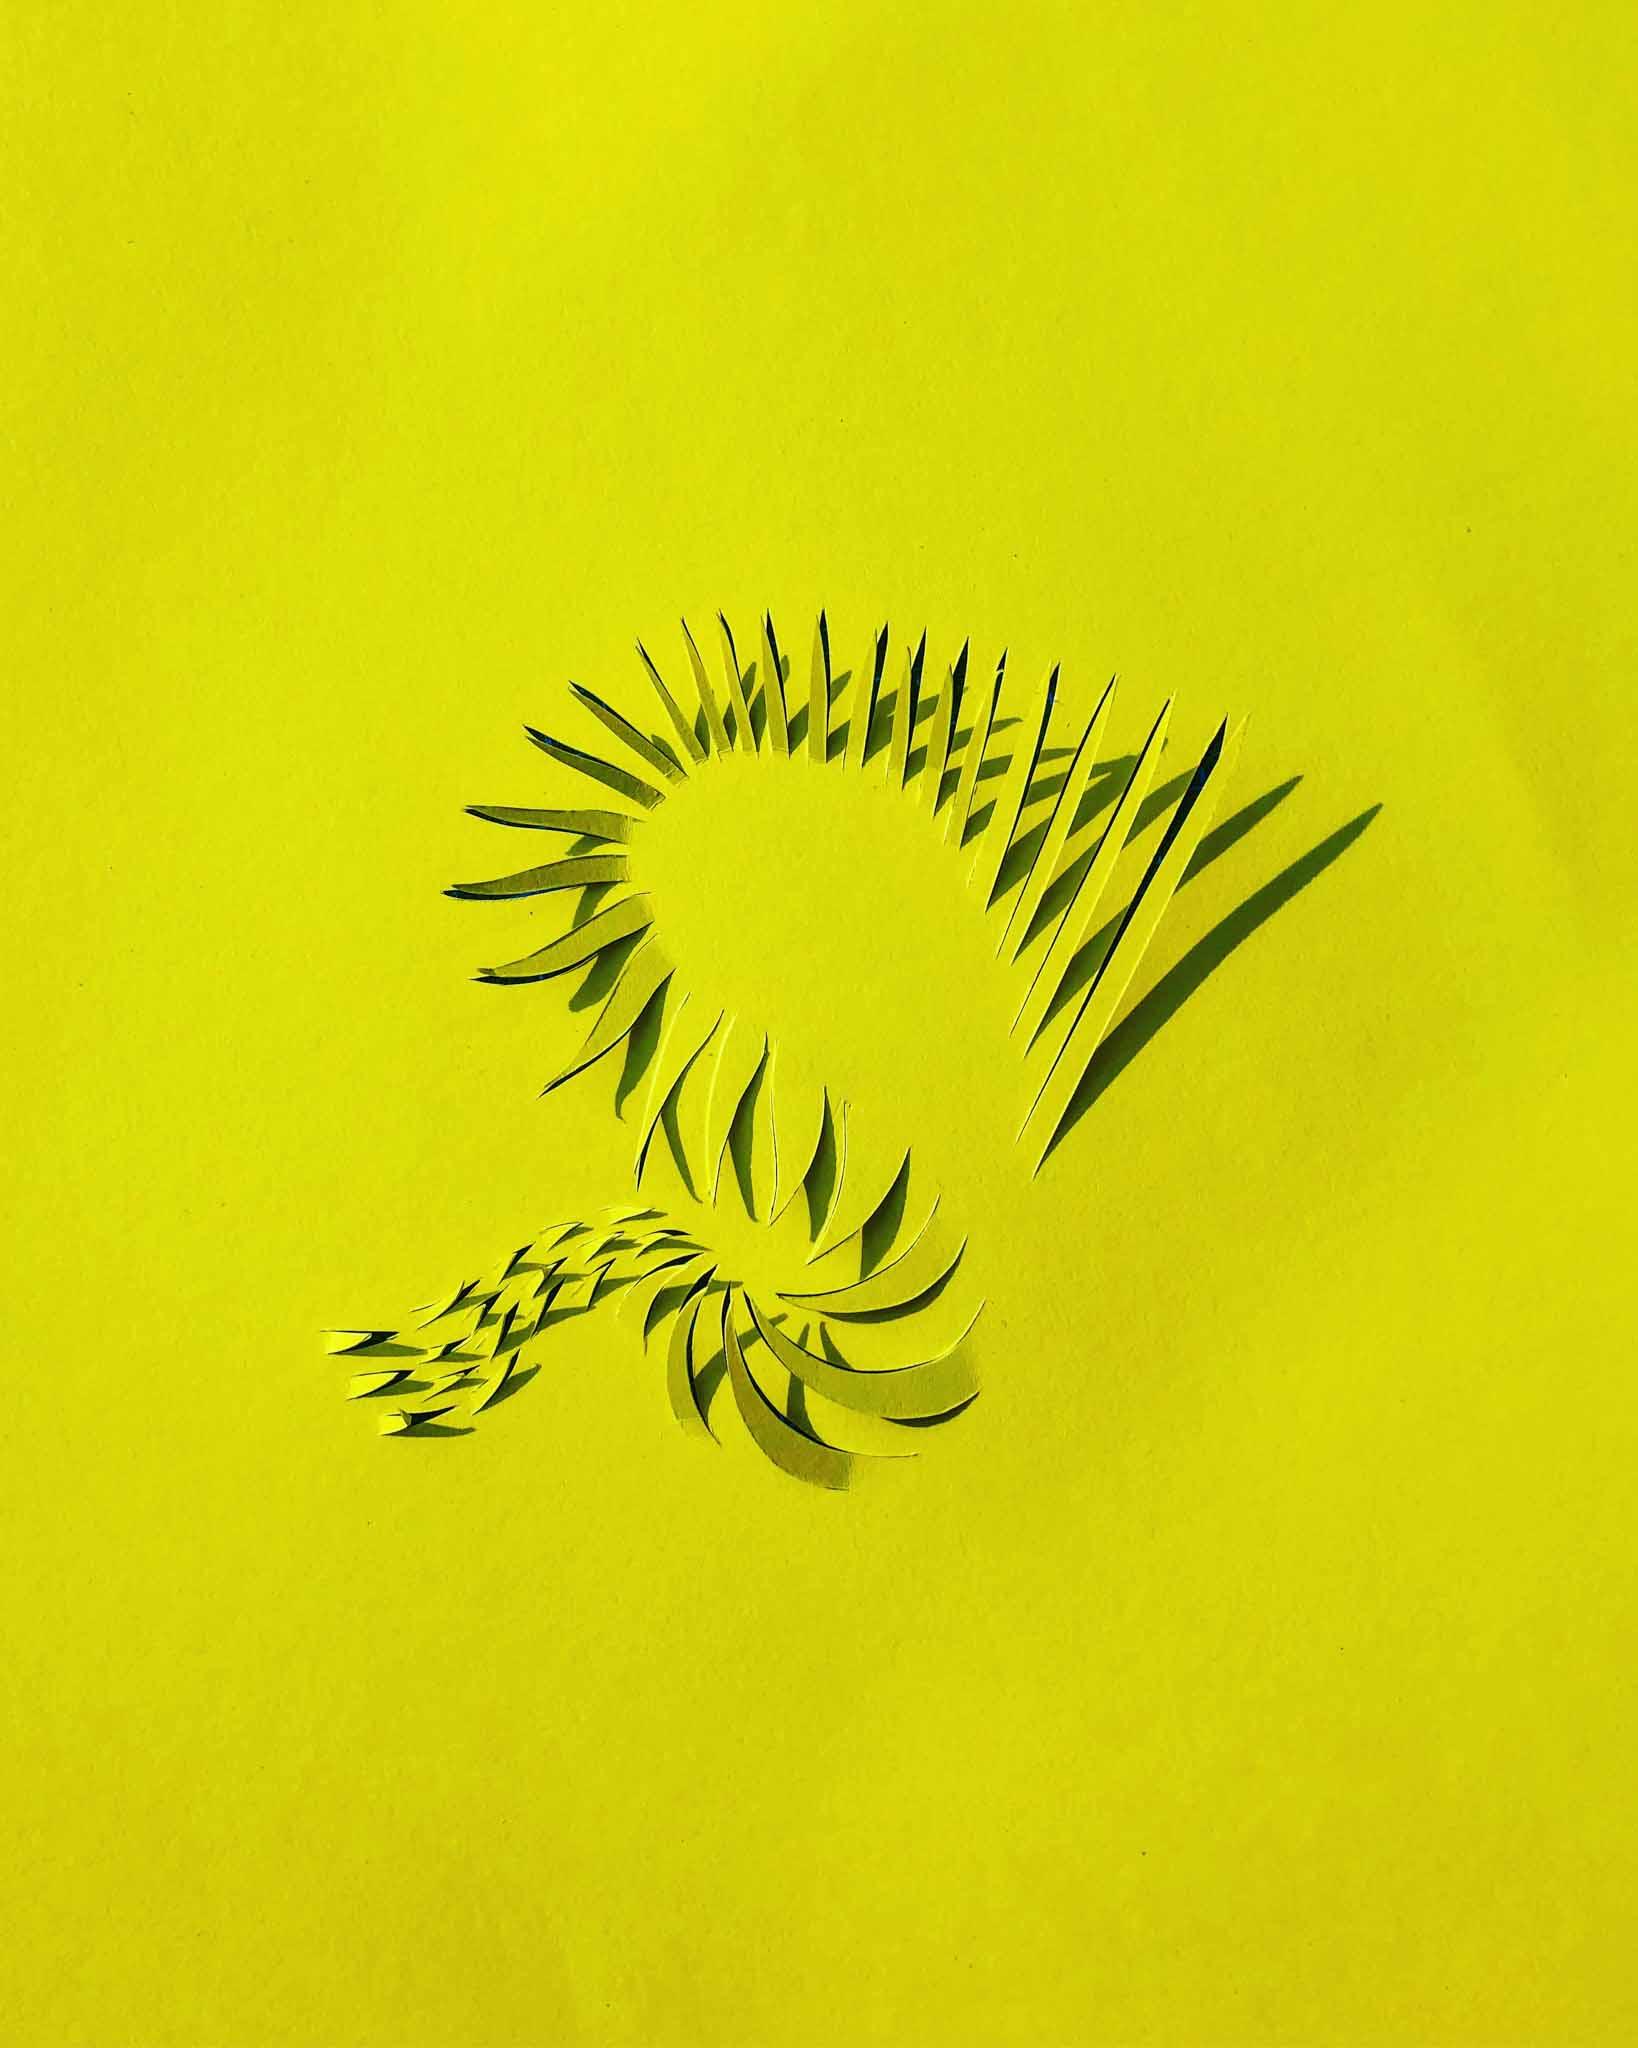 Papercuttings_yellow_sanneneuteboomjpg